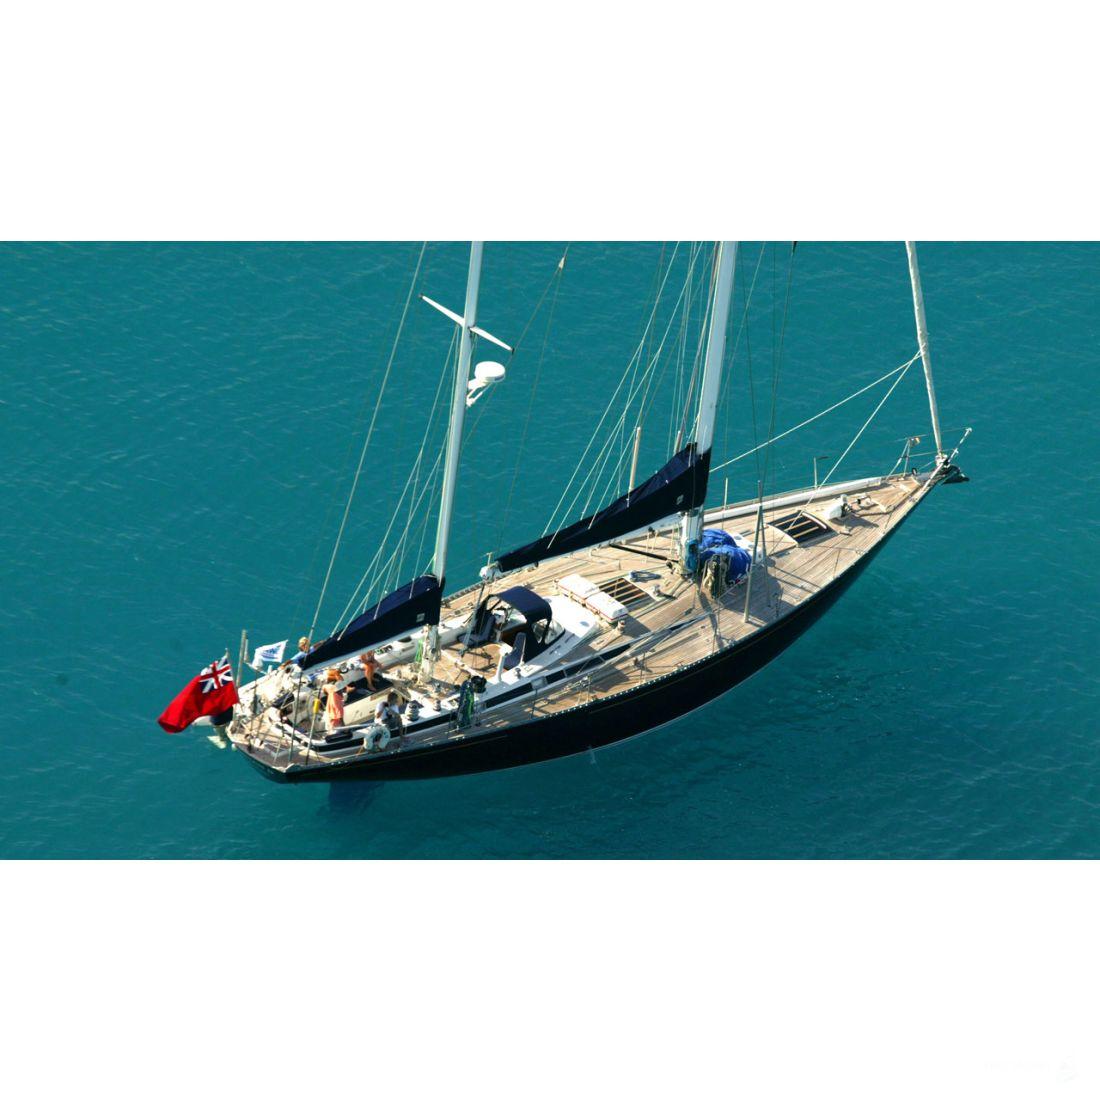 Yacht Charter Swan 65 im Mittelmeer